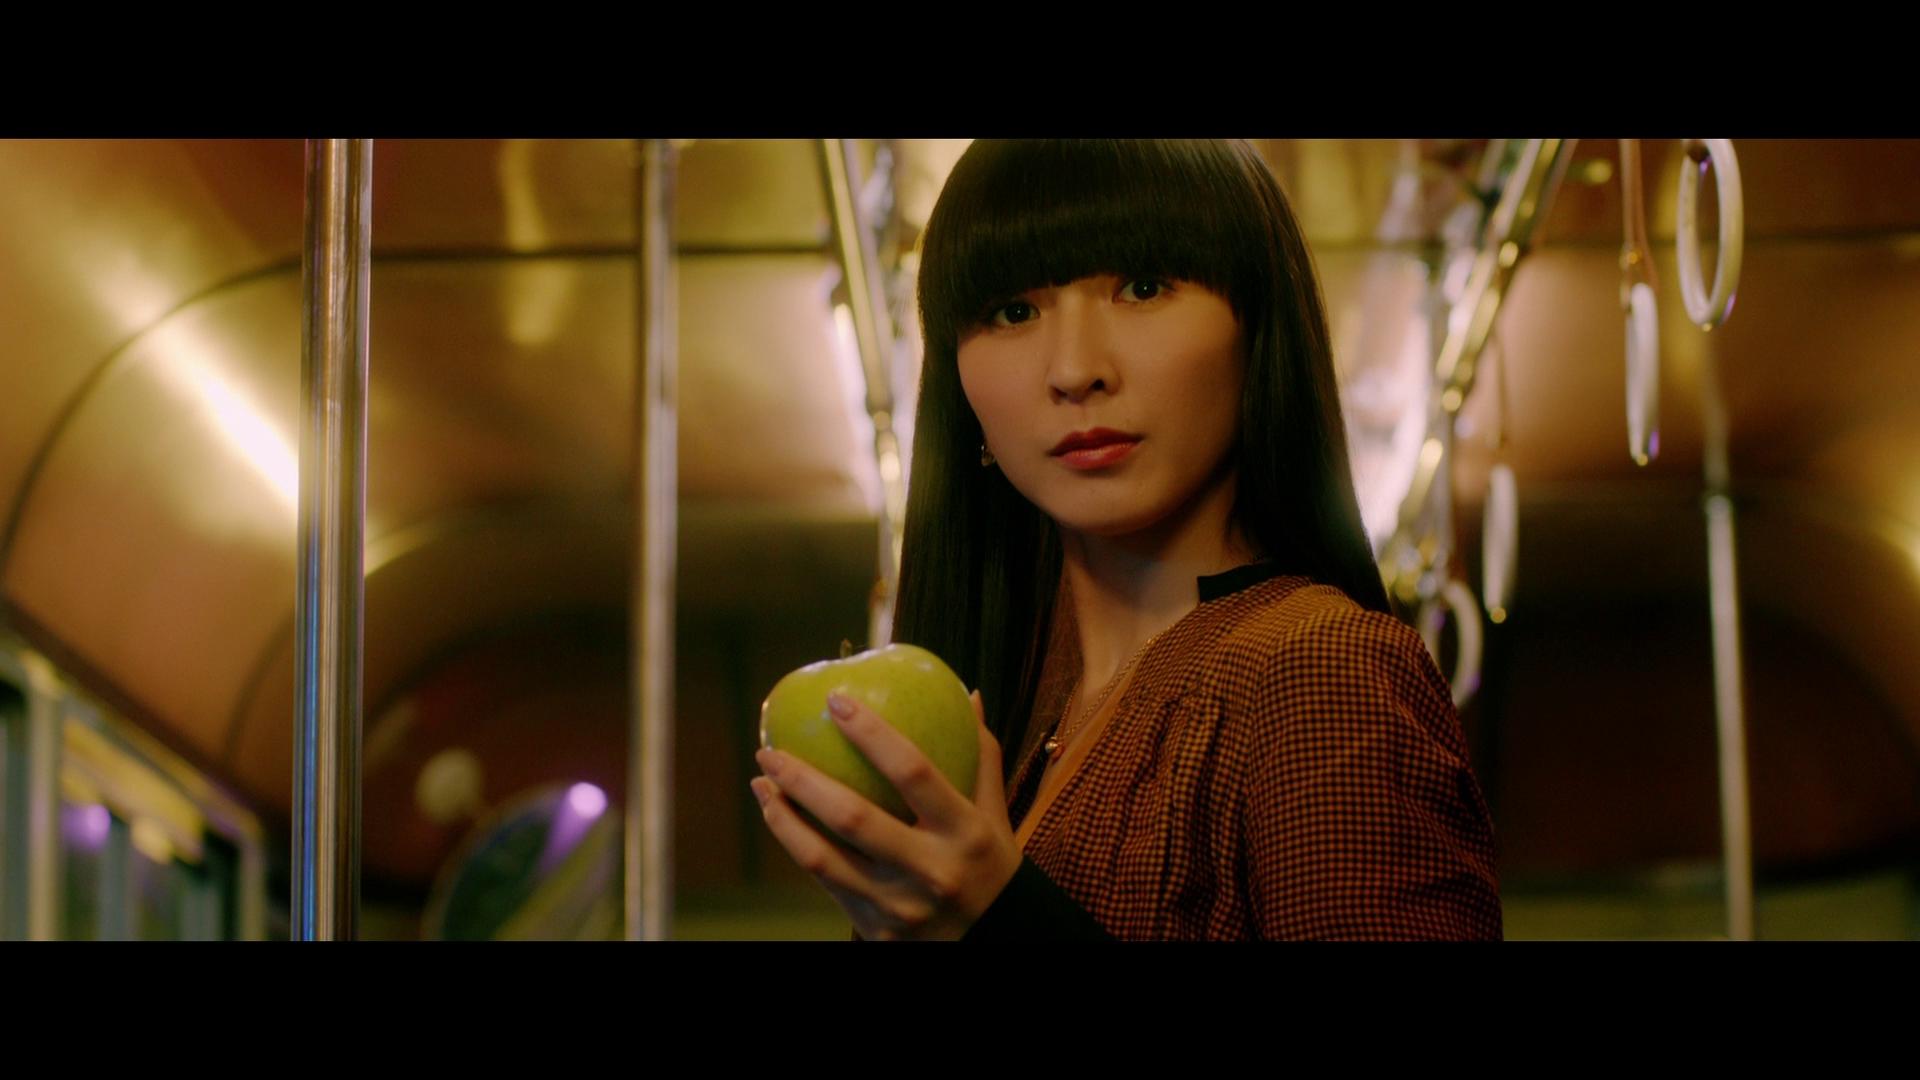 20180823.1555.4 Perfume - Let Me Know (PV) (Blu-Ray) (JPOP.ru).m2ts 1.png